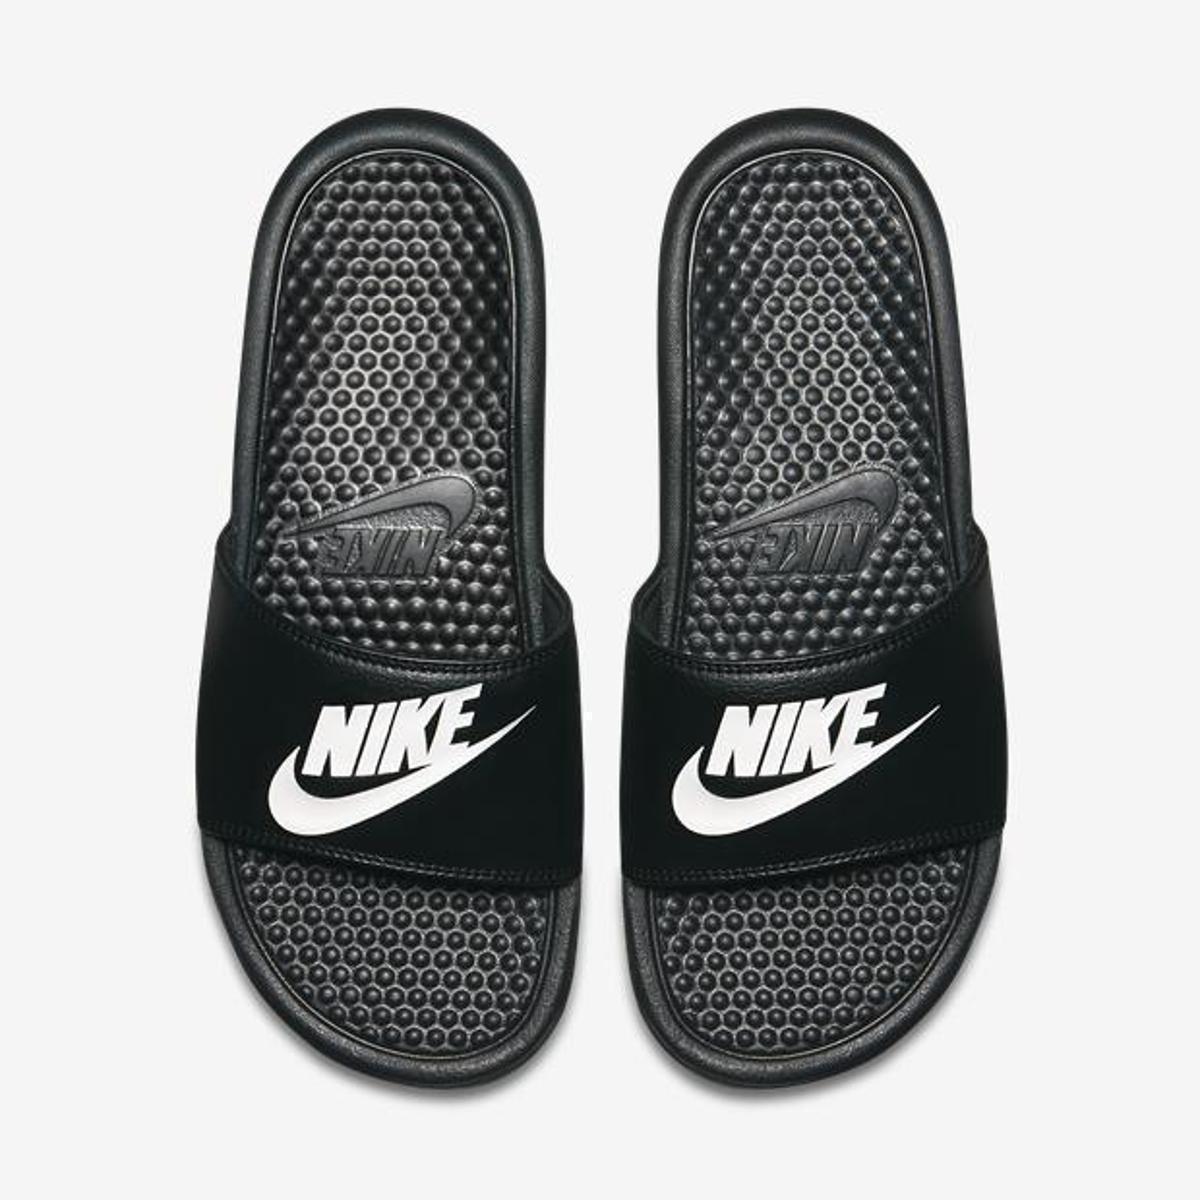 Sandália Nike Benassi JDI Masculina - Tam: 39.5